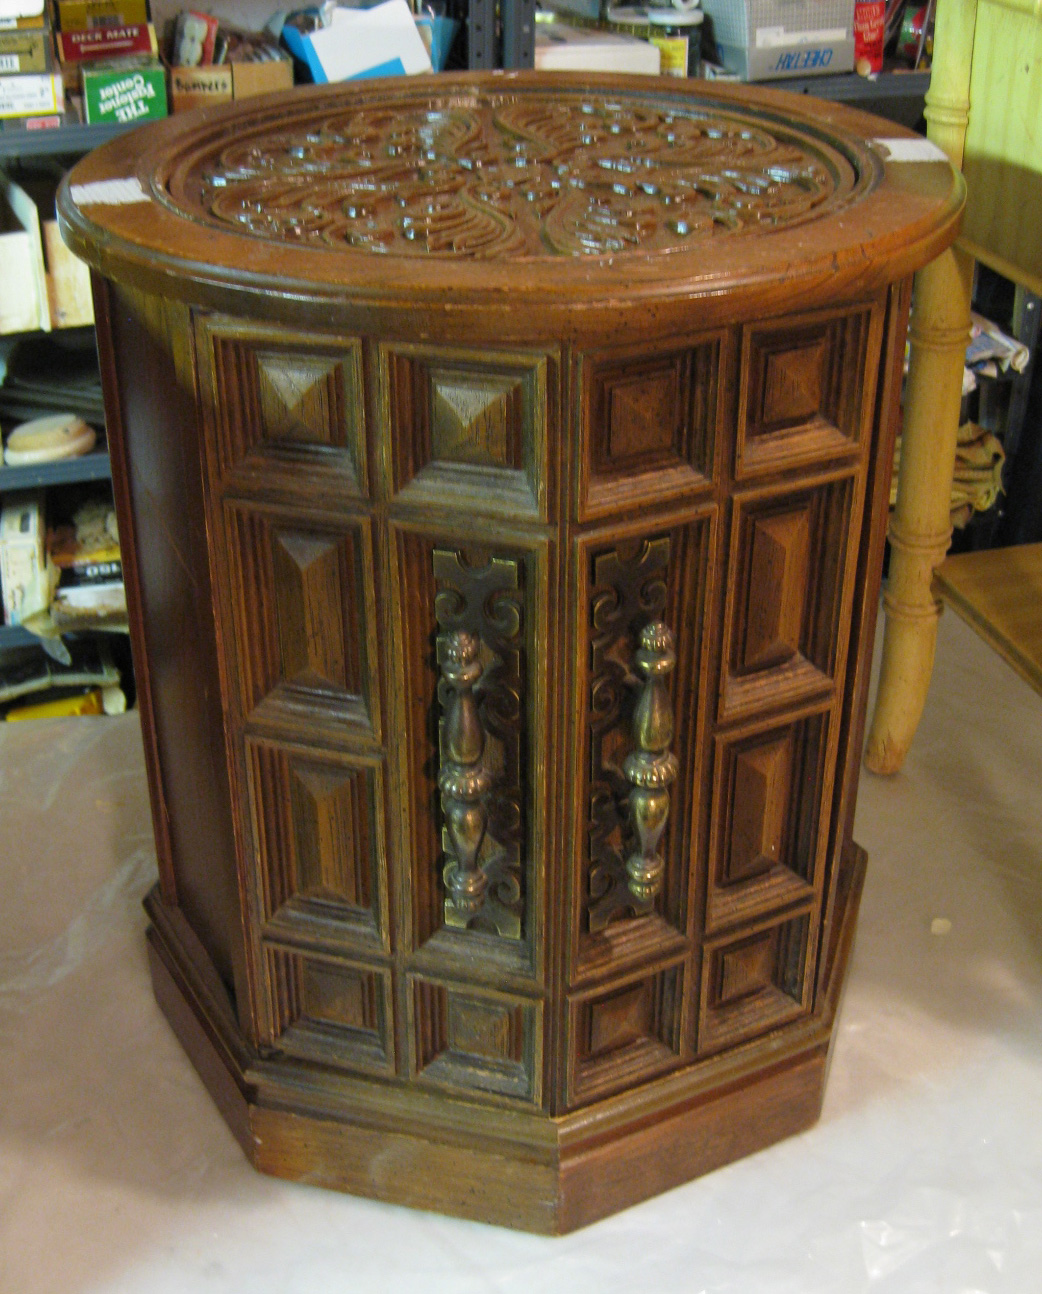 Roomscapes Decorative Arts: The Furniture